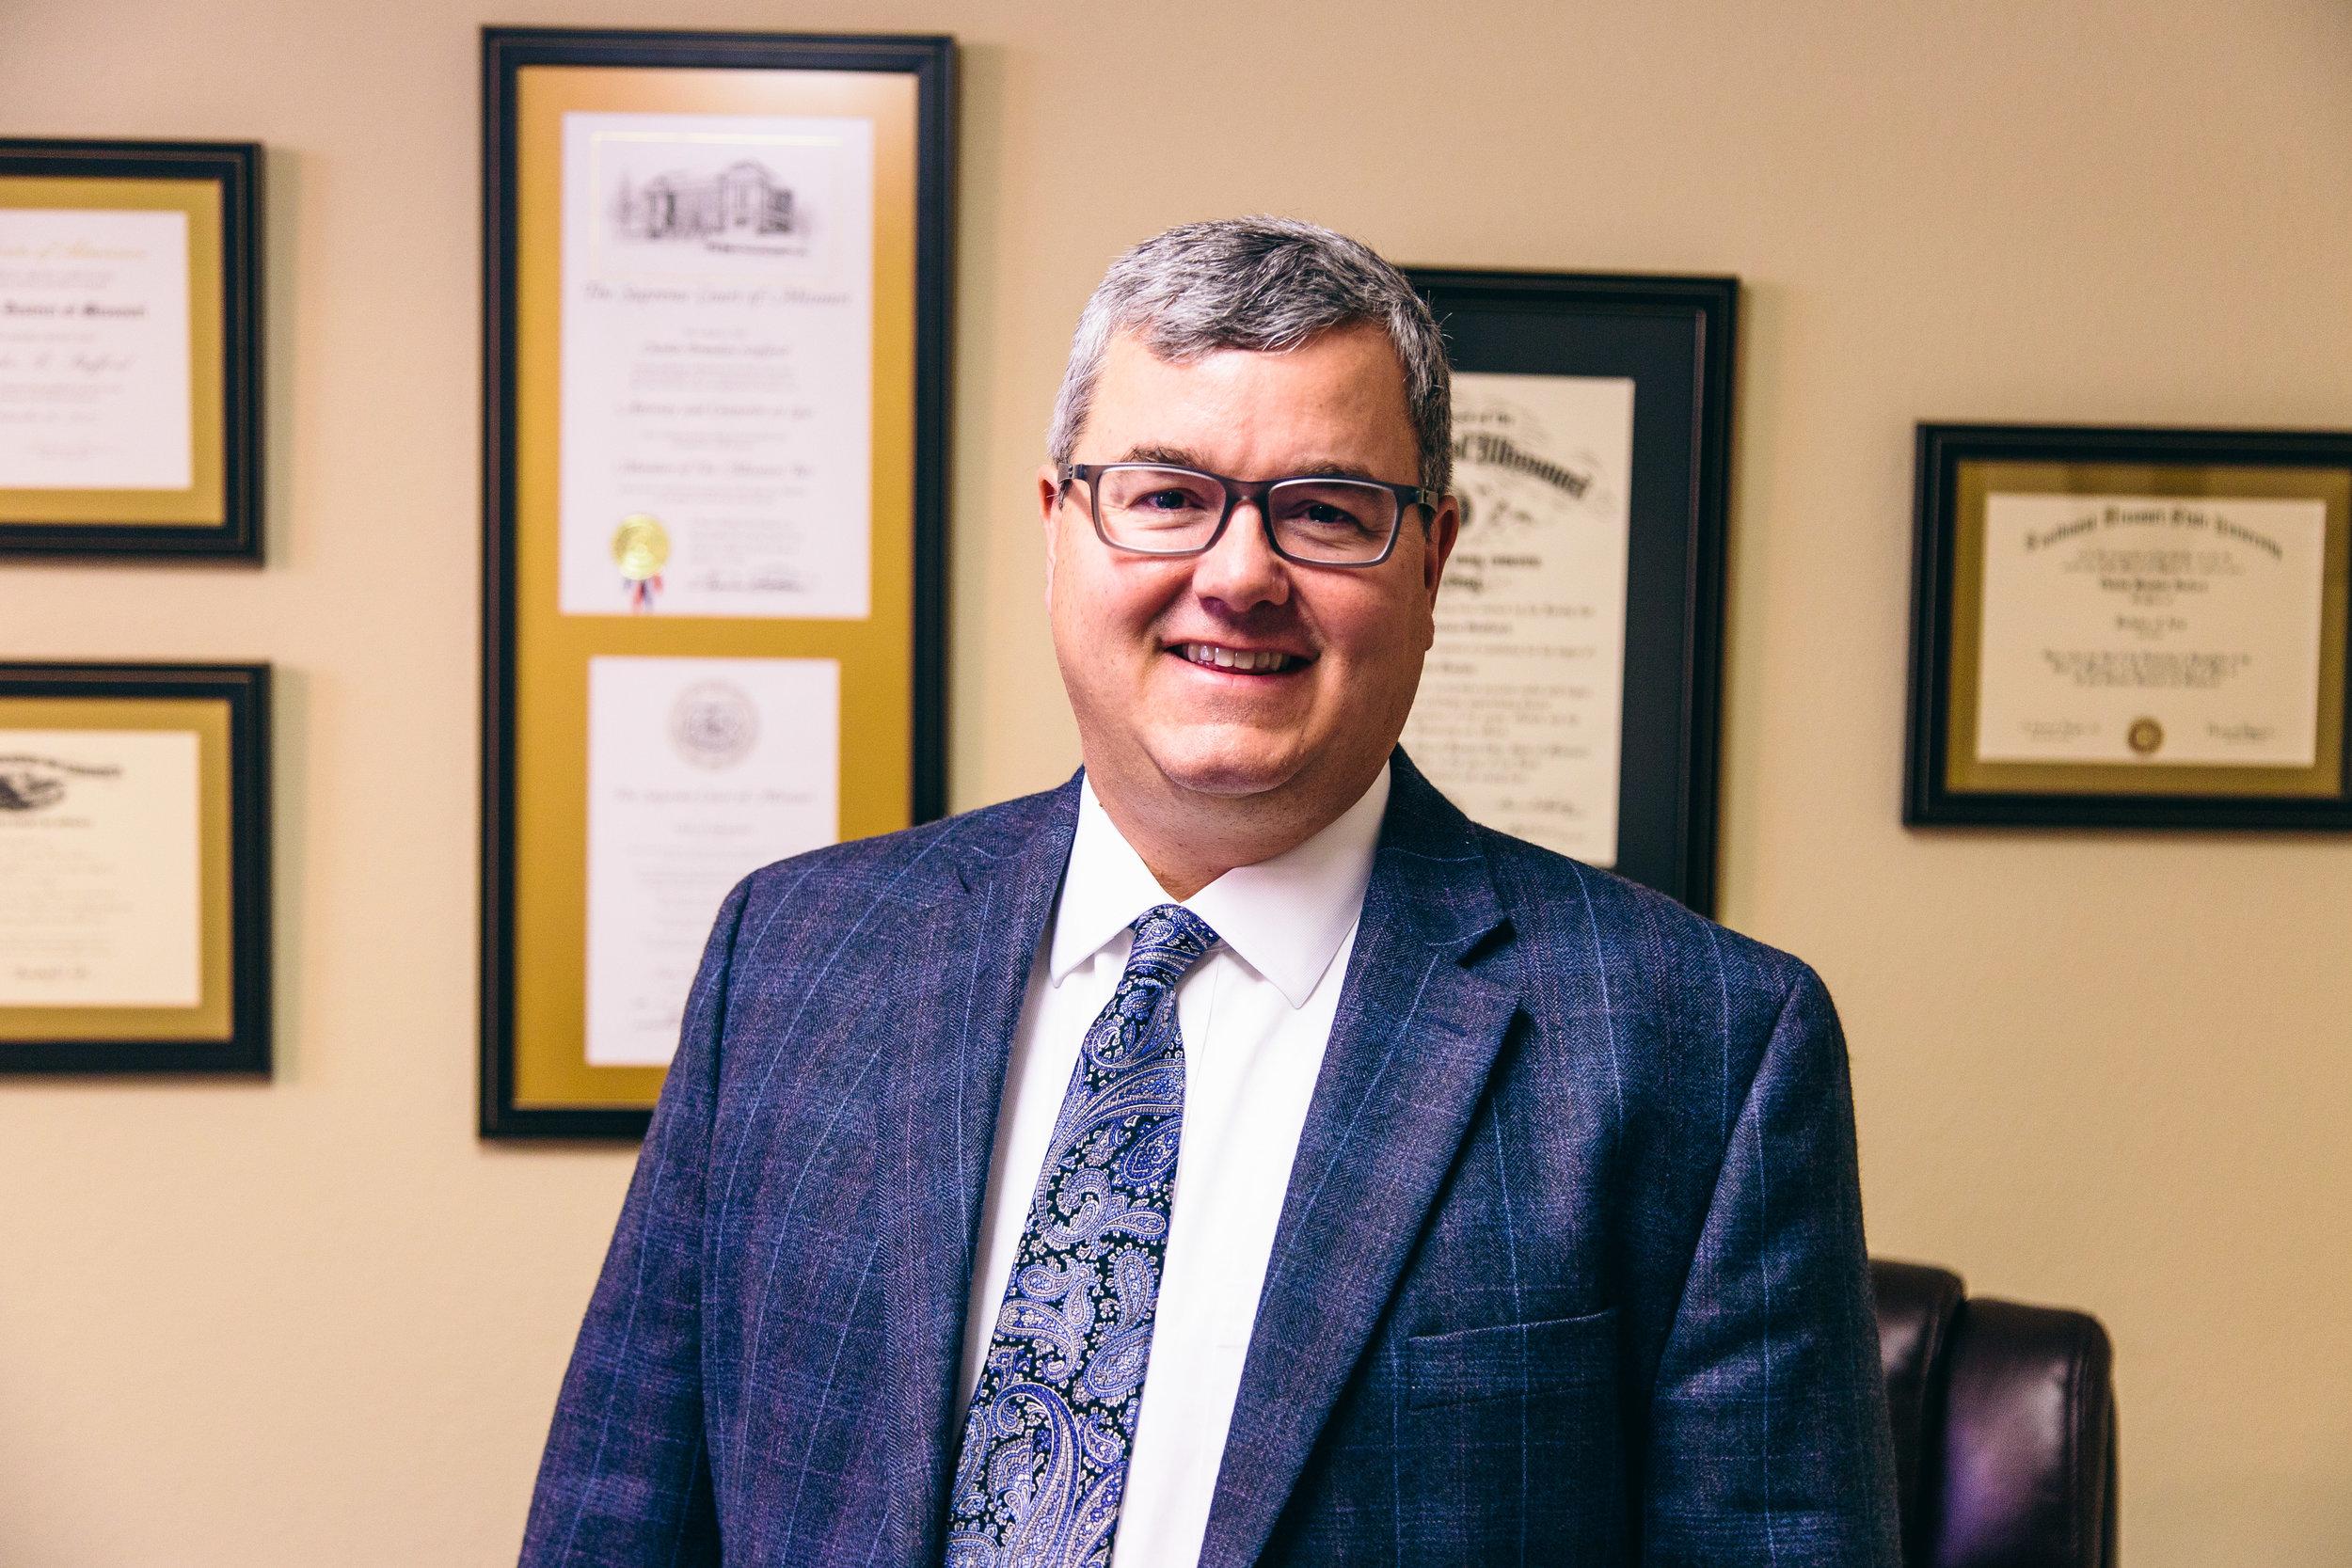 Brandon Stafford. Attorney at Law.